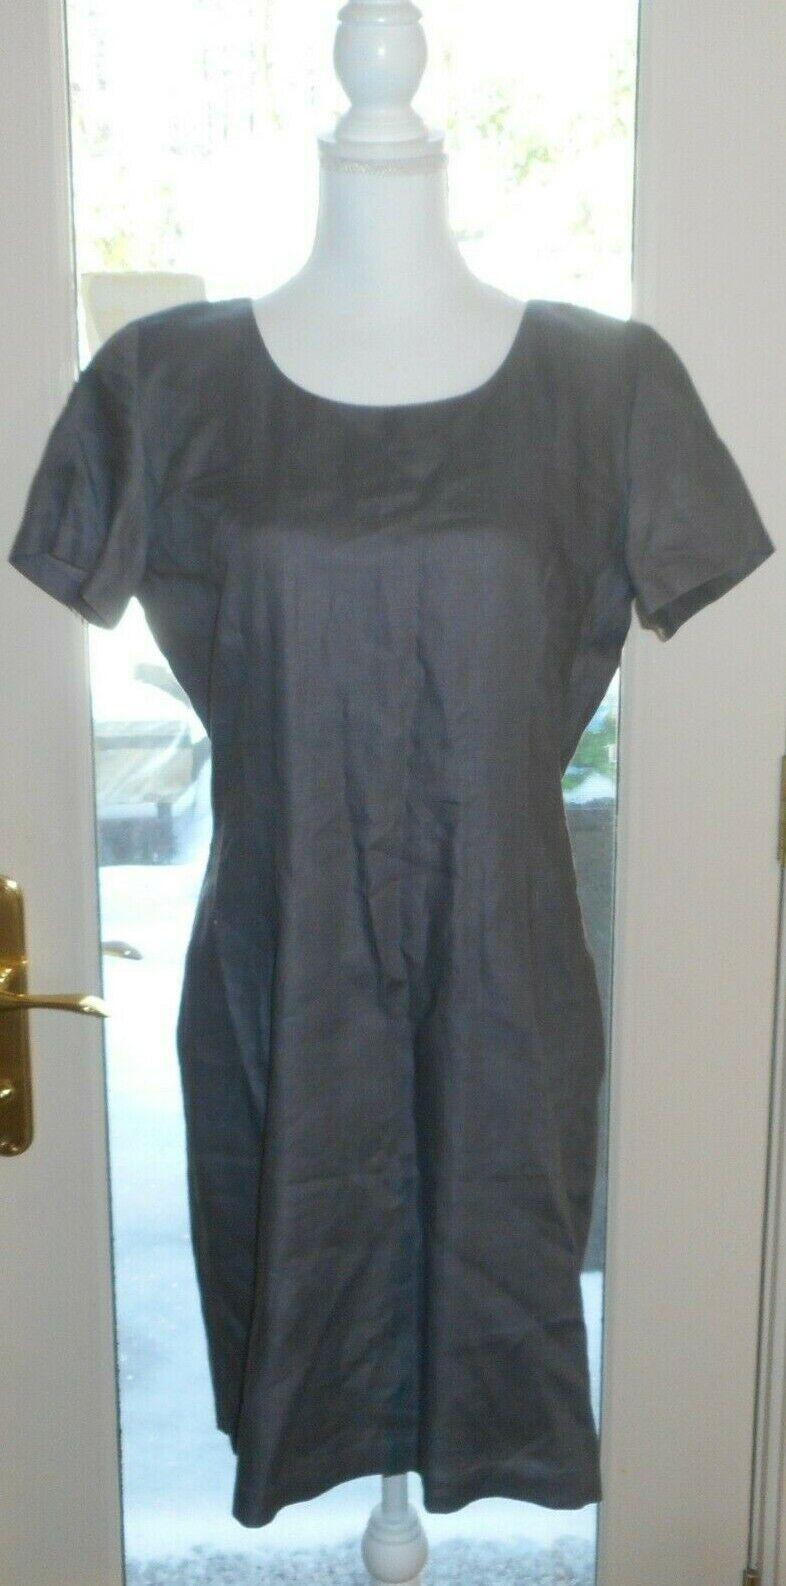 TWEEDS Sz 12 Gray Zipper Closure In The Back Short Sleeve Dress